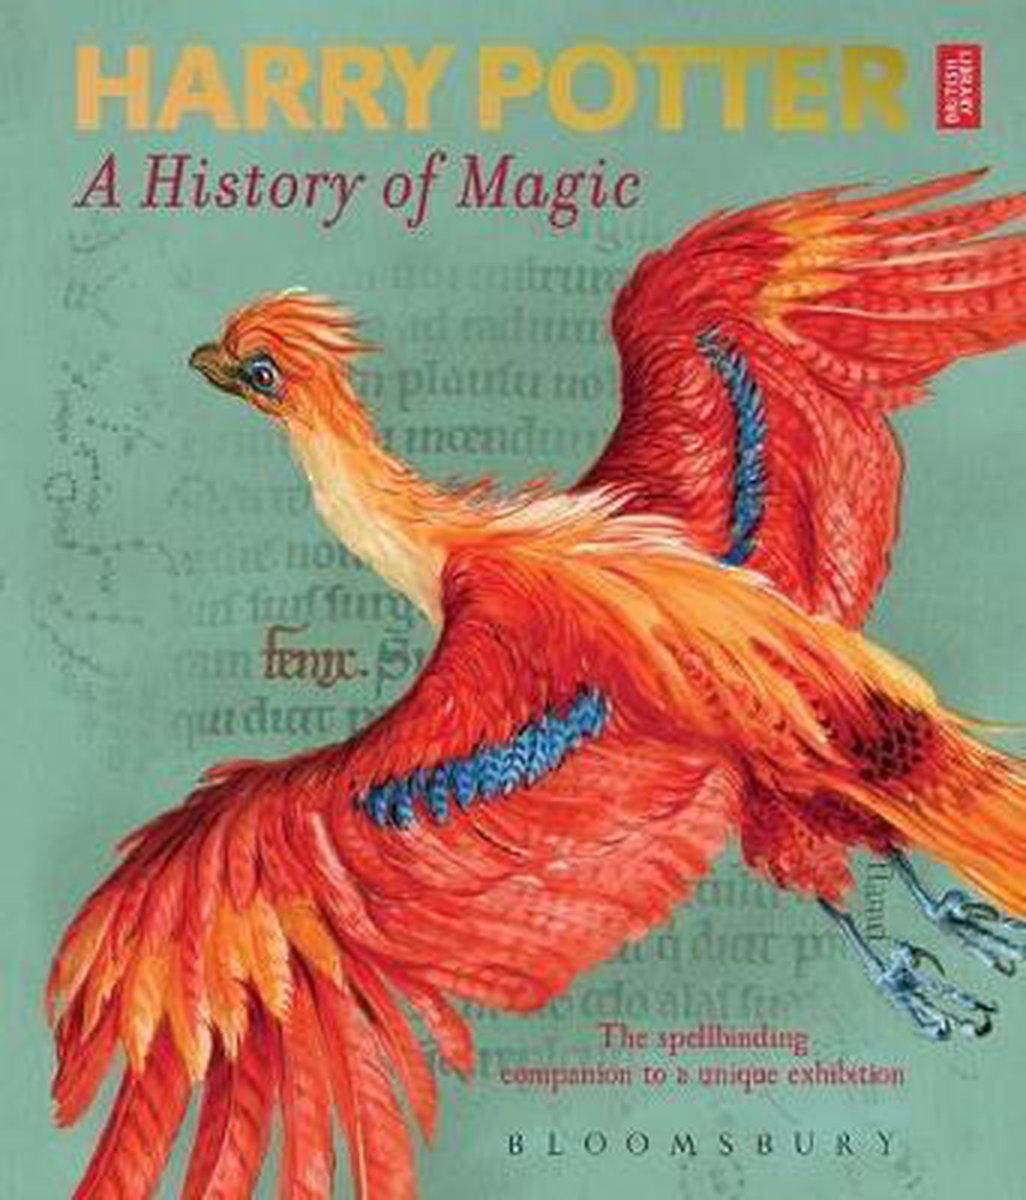 Harry Potter - A History of Magic - British British Library